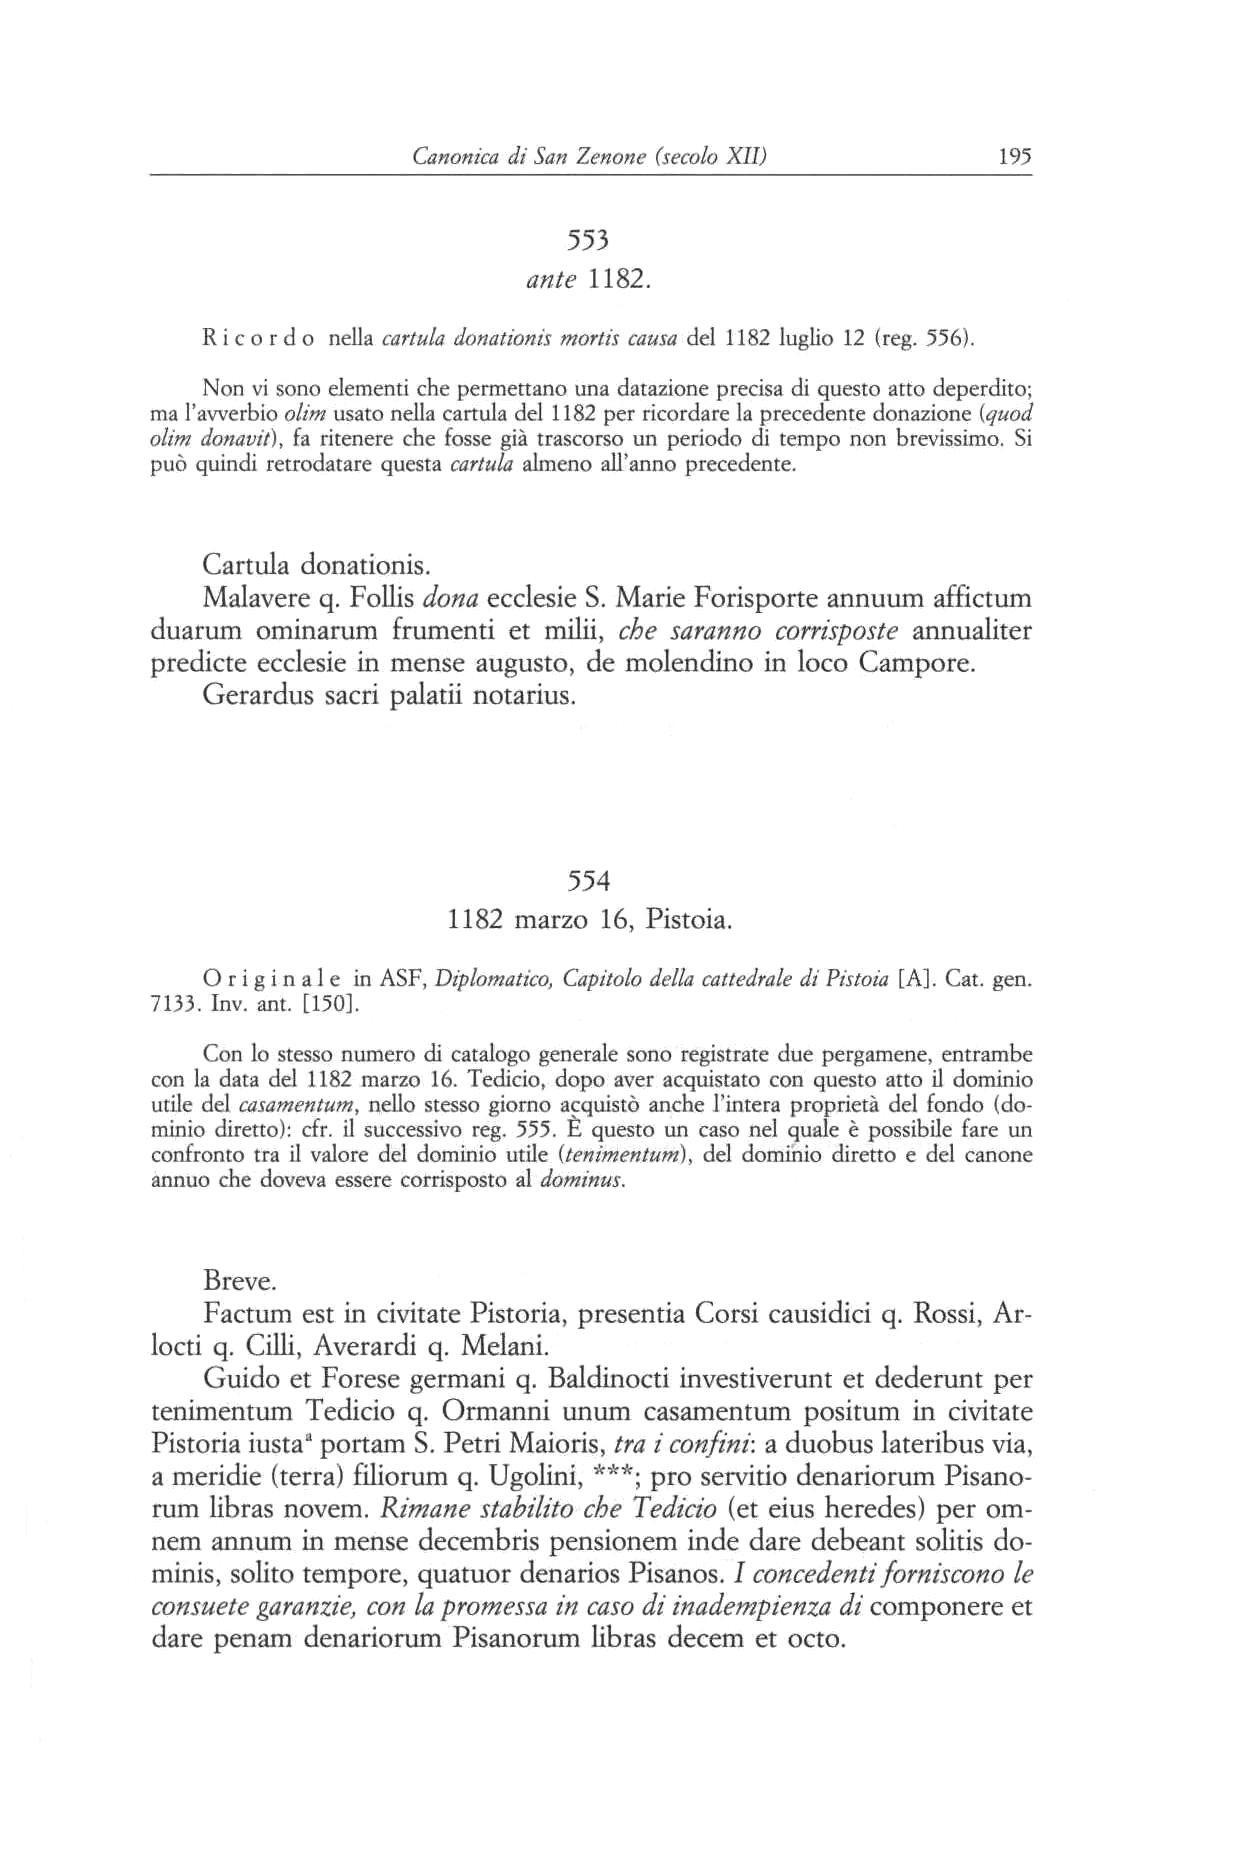 Canonica S. Zenone XII 0195.jpg